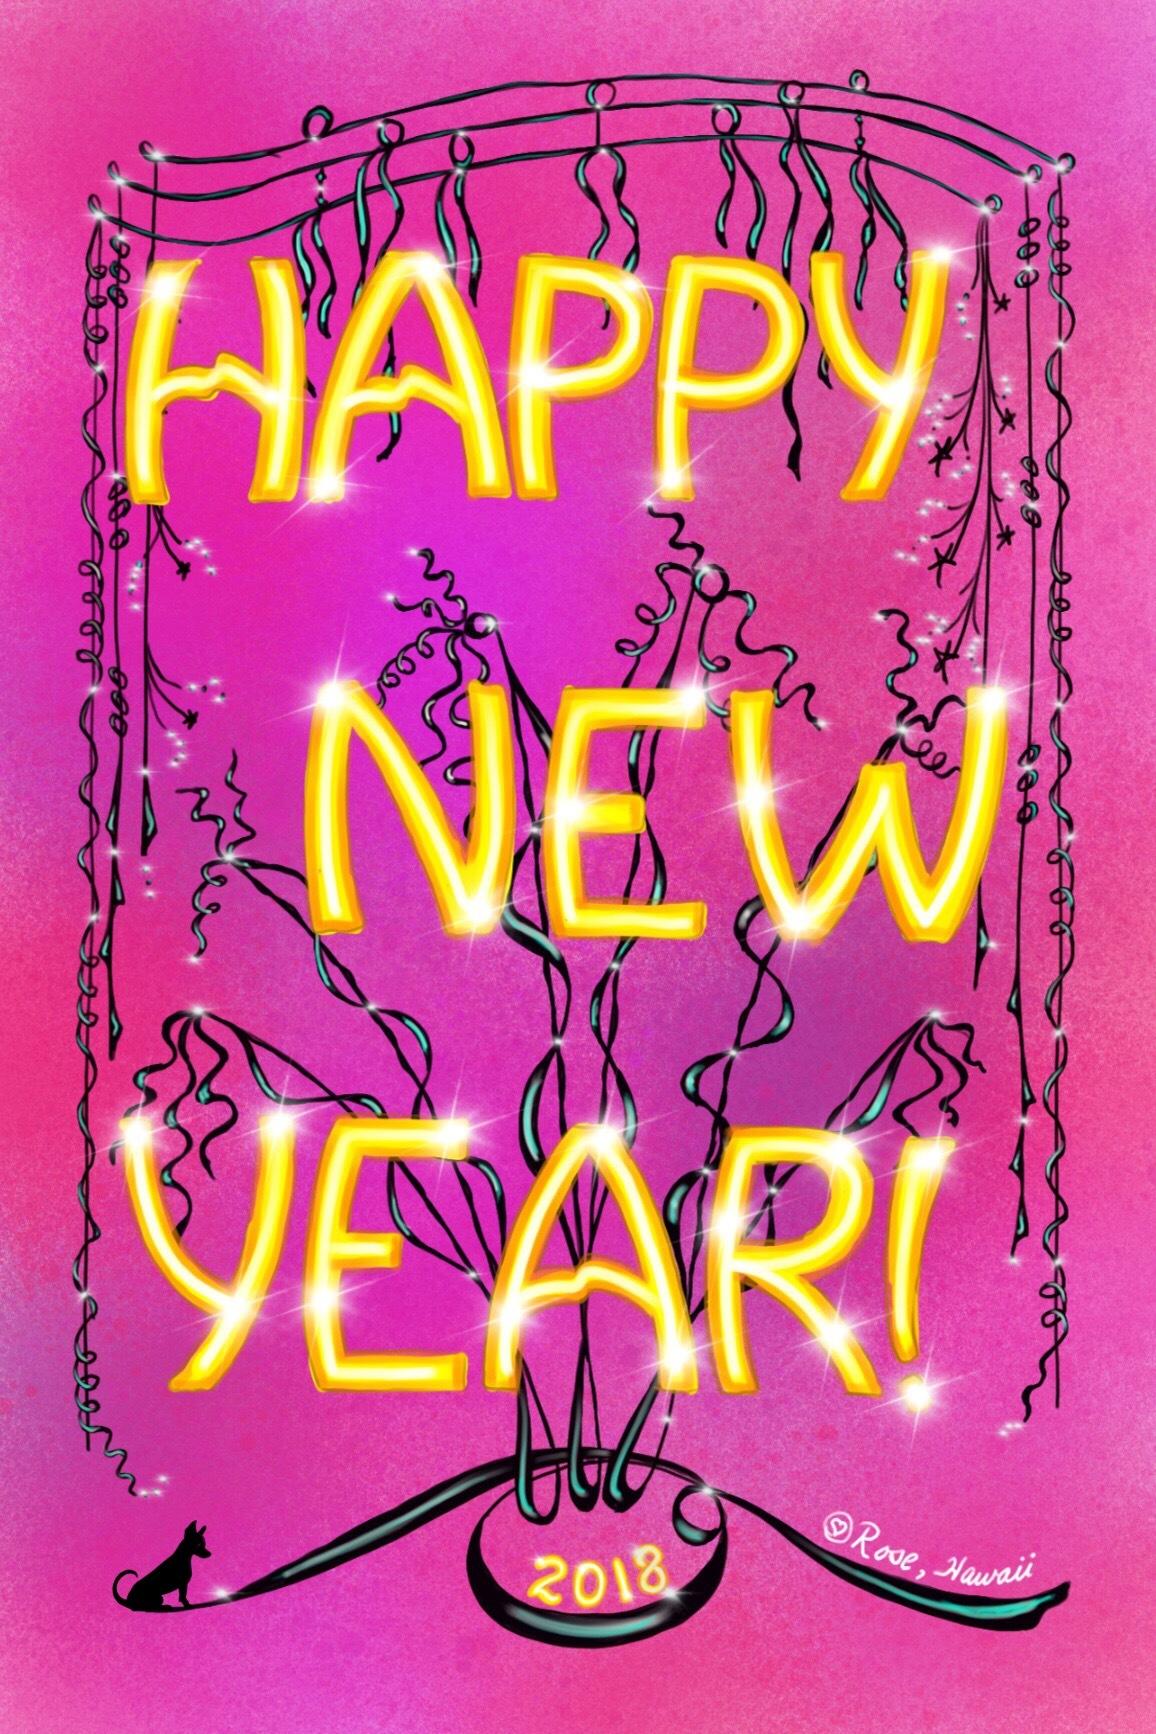 Happy New Year! 2